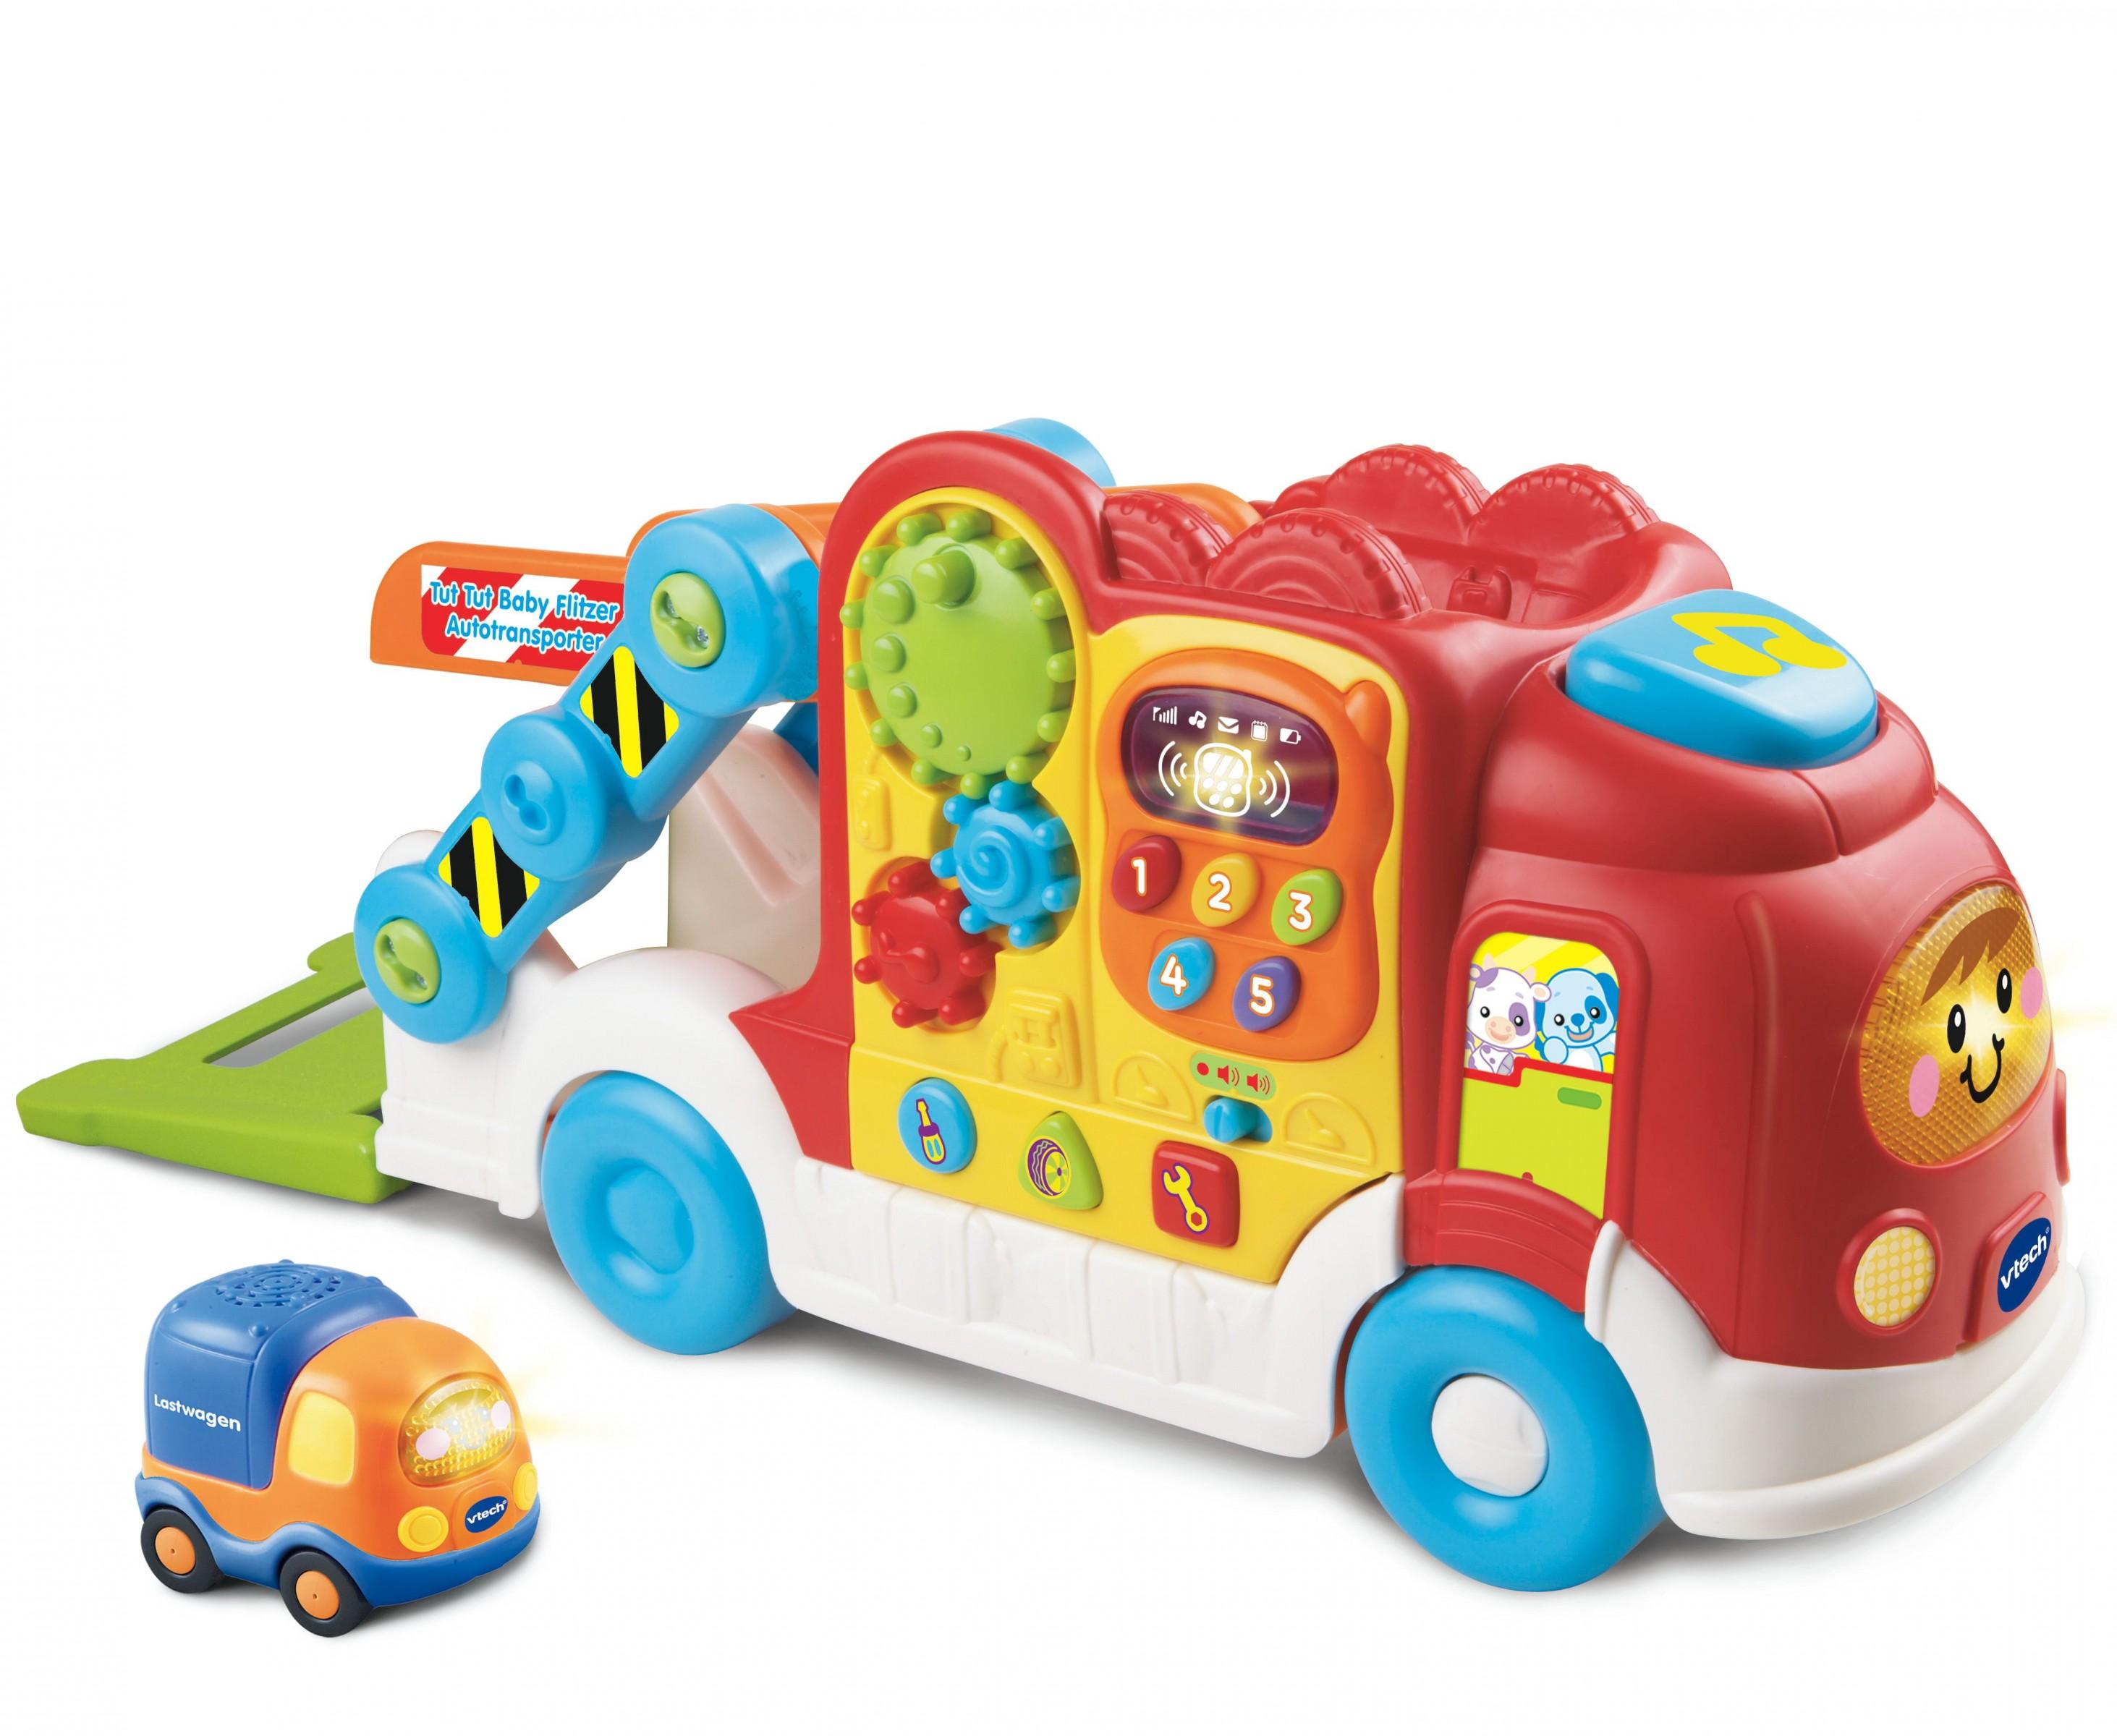 VTech Tut Tut Baby Flitzer  - Autotransporter